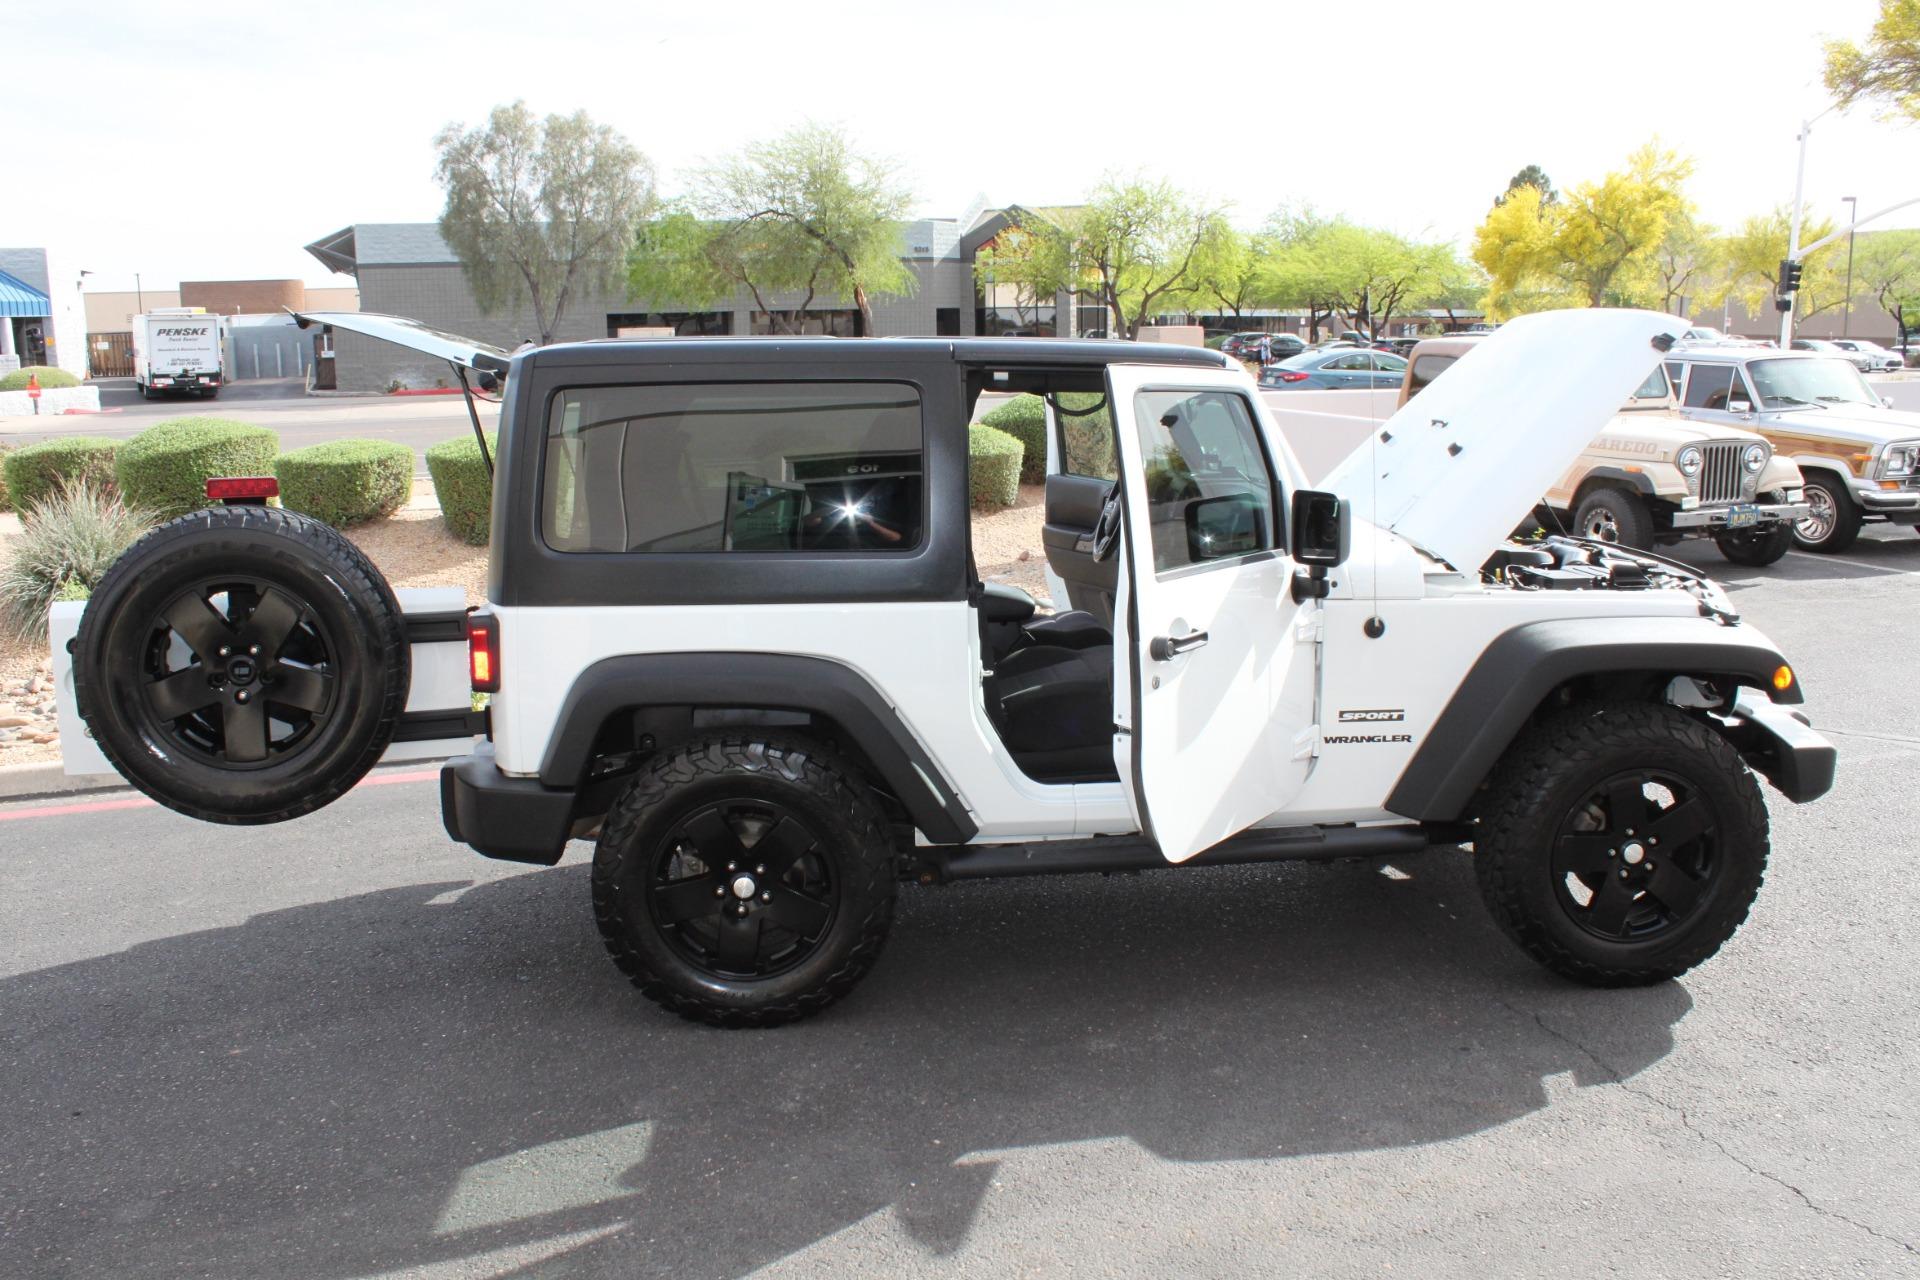 Used-2012-Jeep-Wrangler-Freedom-Edition-4X4-Toyota